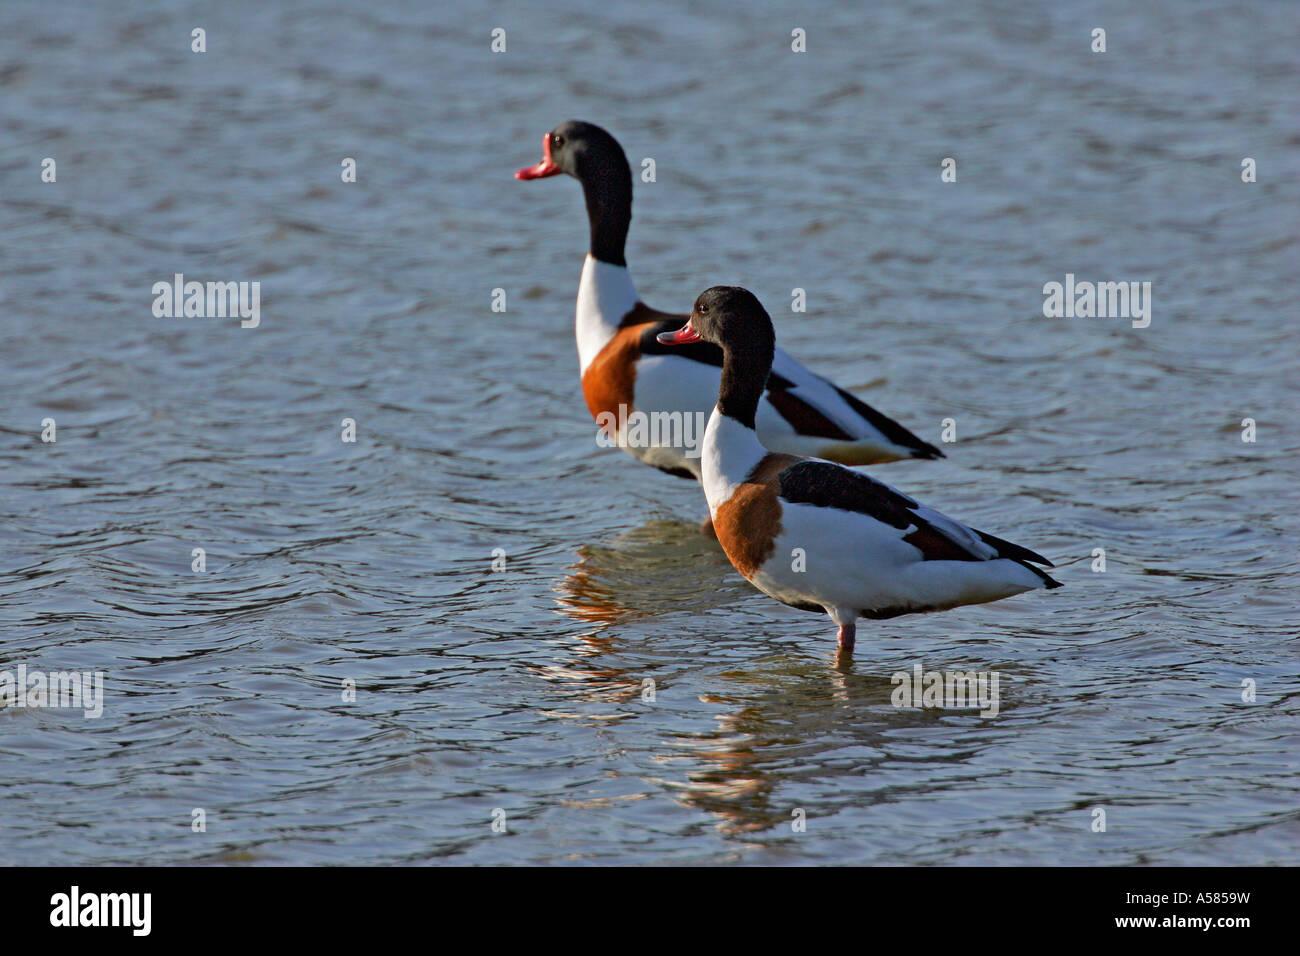 Couple of common shelducks standing in the water (Tadorna tadorna) Stock Photo